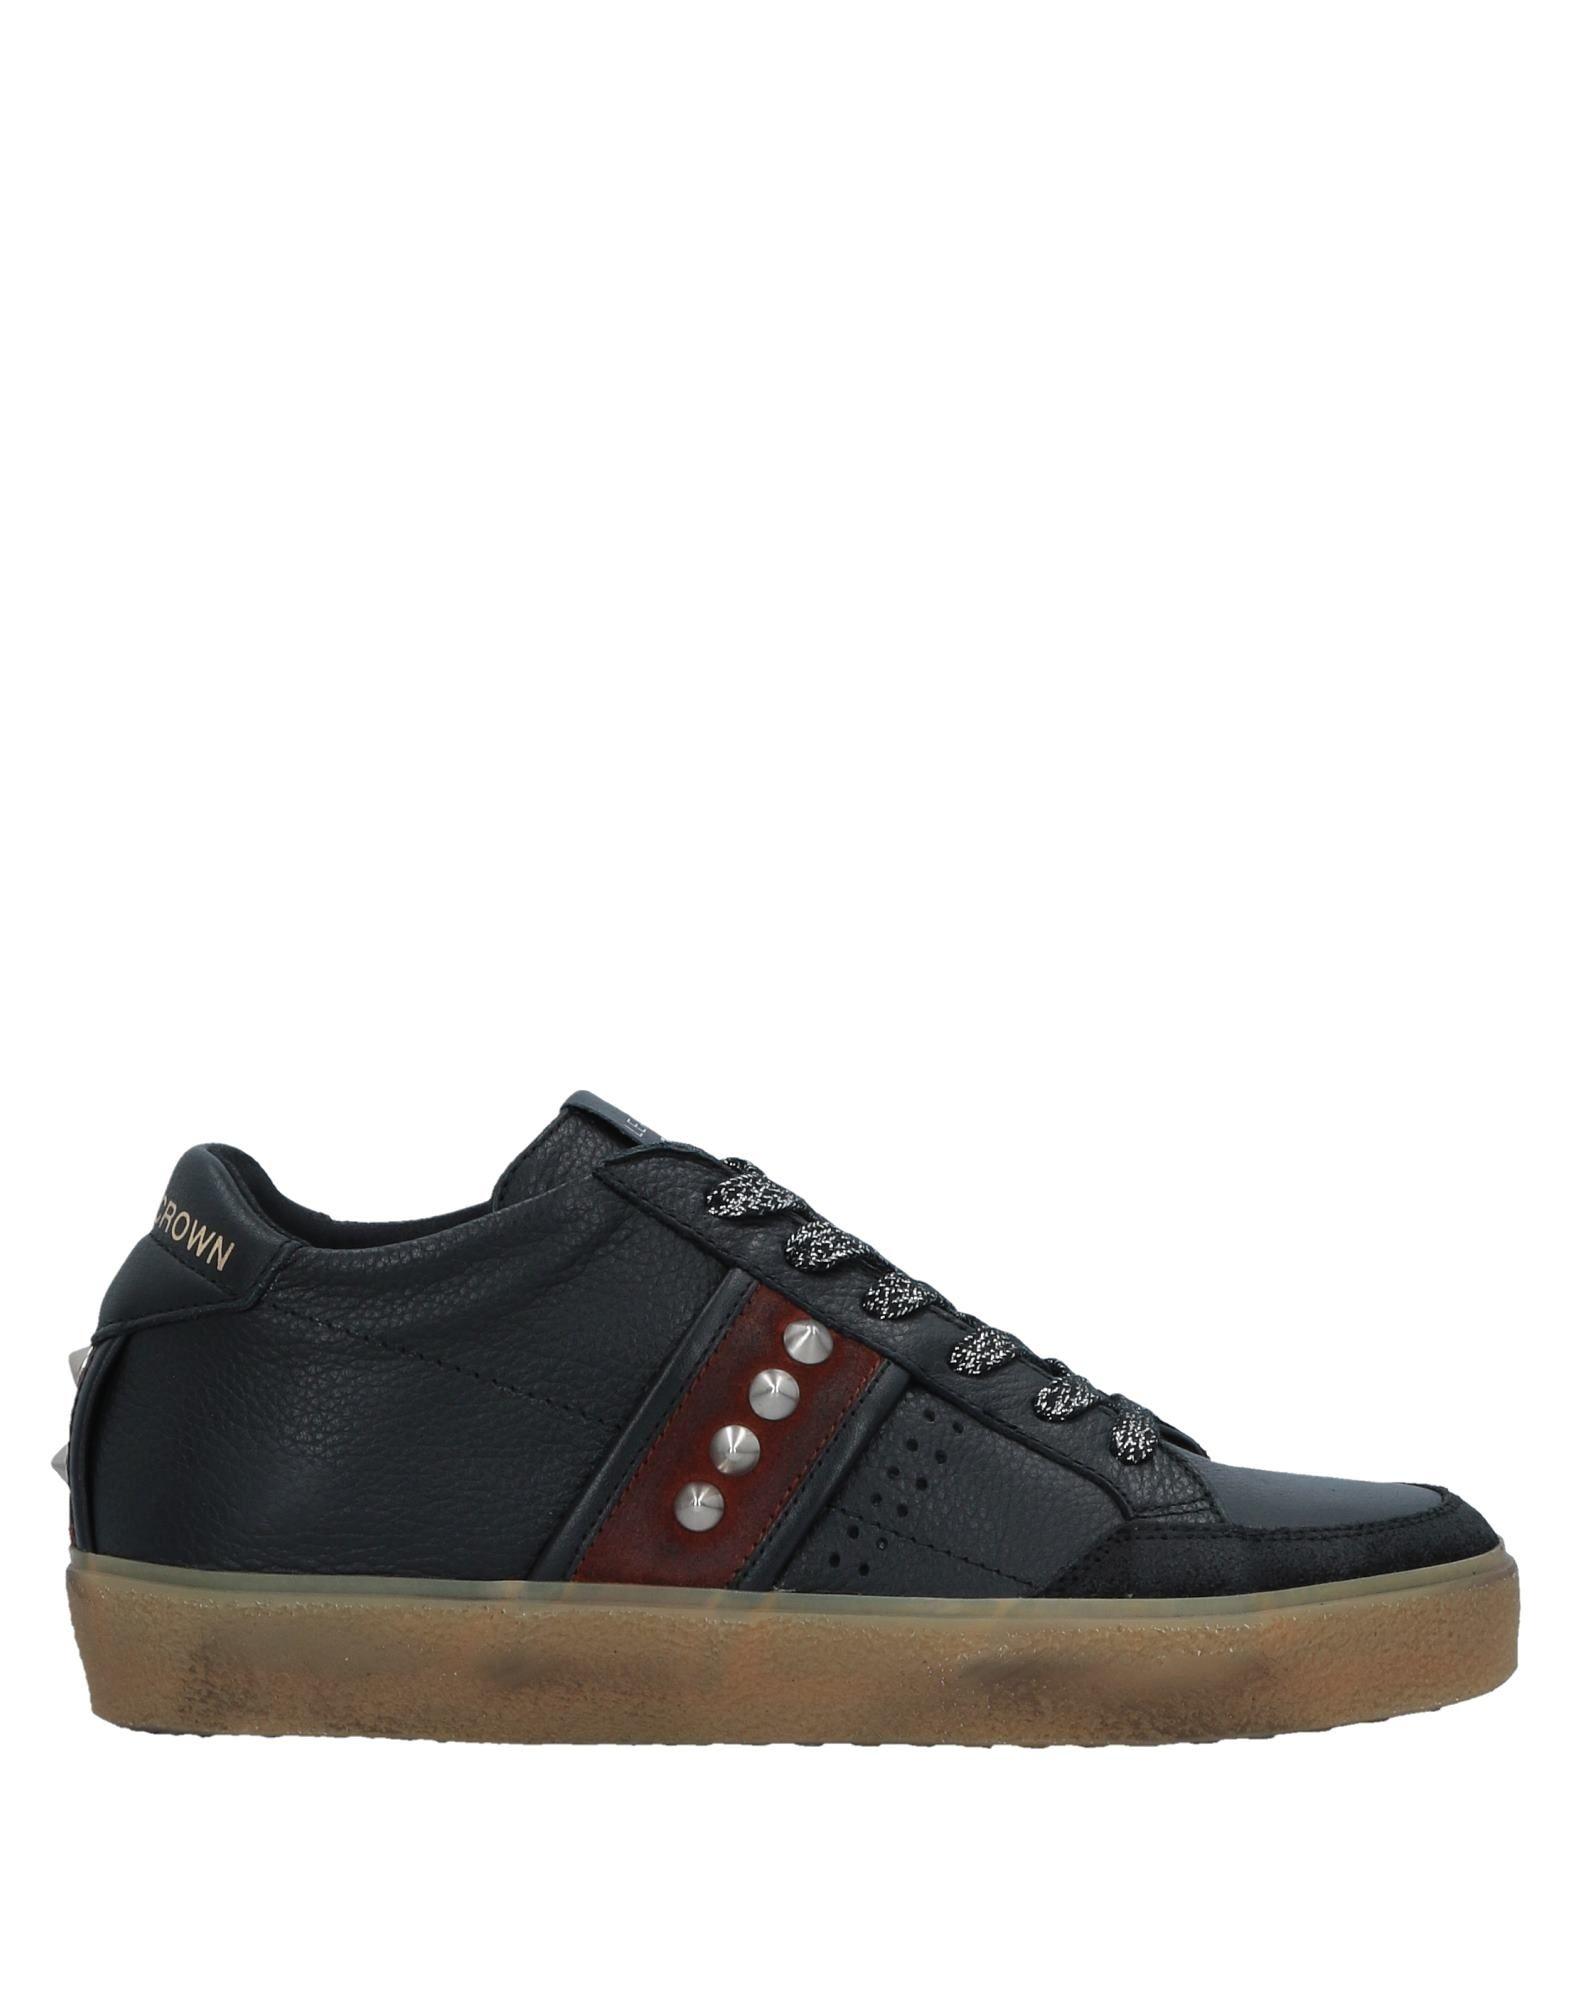 Scarpe da Ginnastica Leather - Crown Donna - Leather 11526543JS 751152